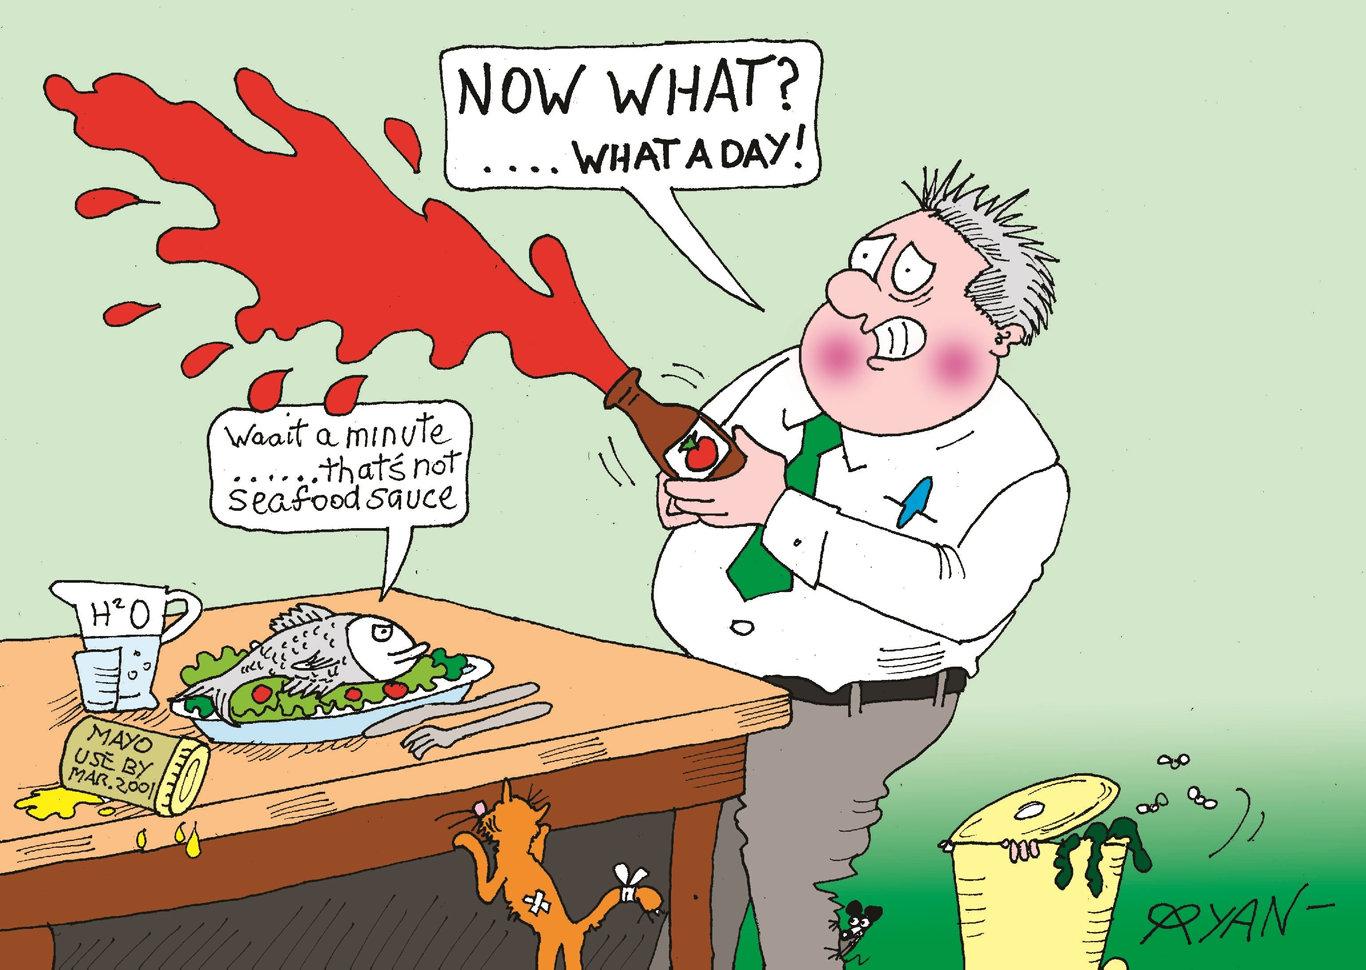 Peter Patter cartoon for 7/3/19